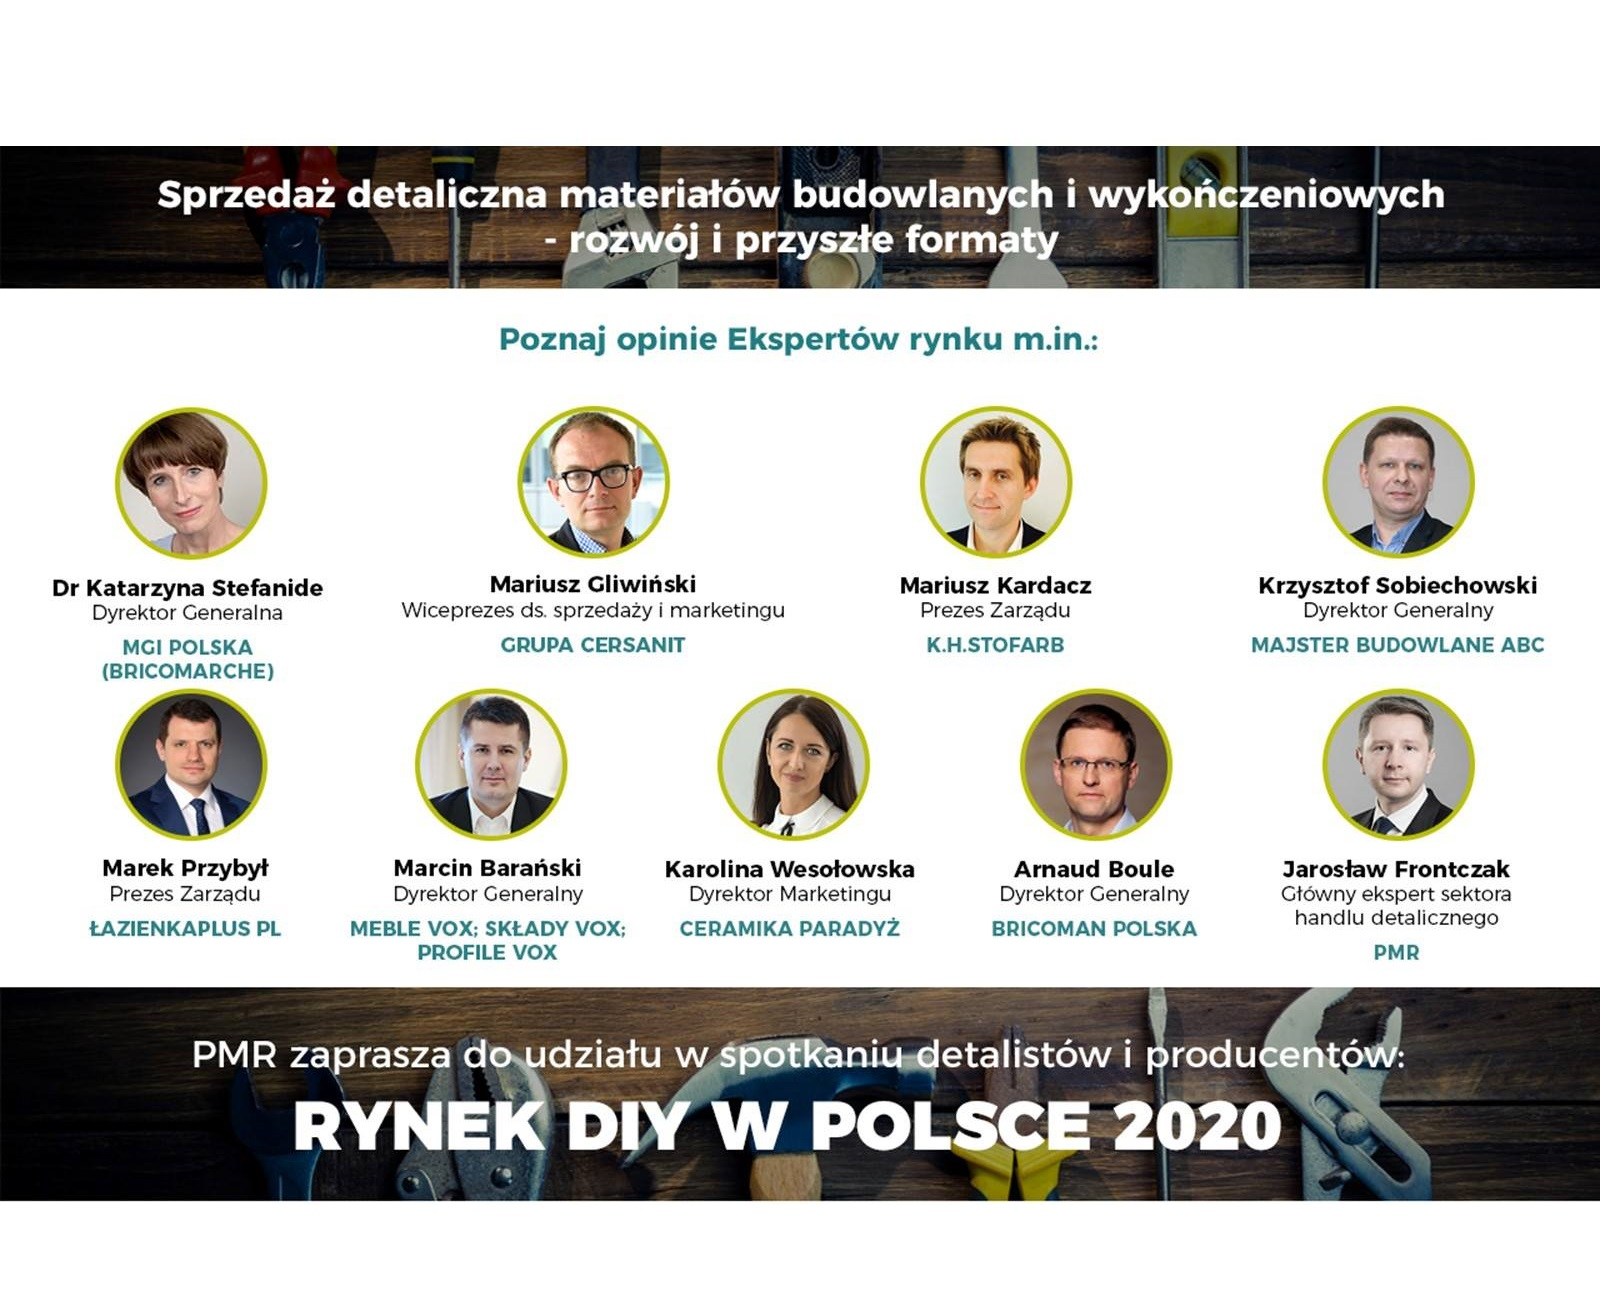 RYNEK DIY* W POLSCE 2020